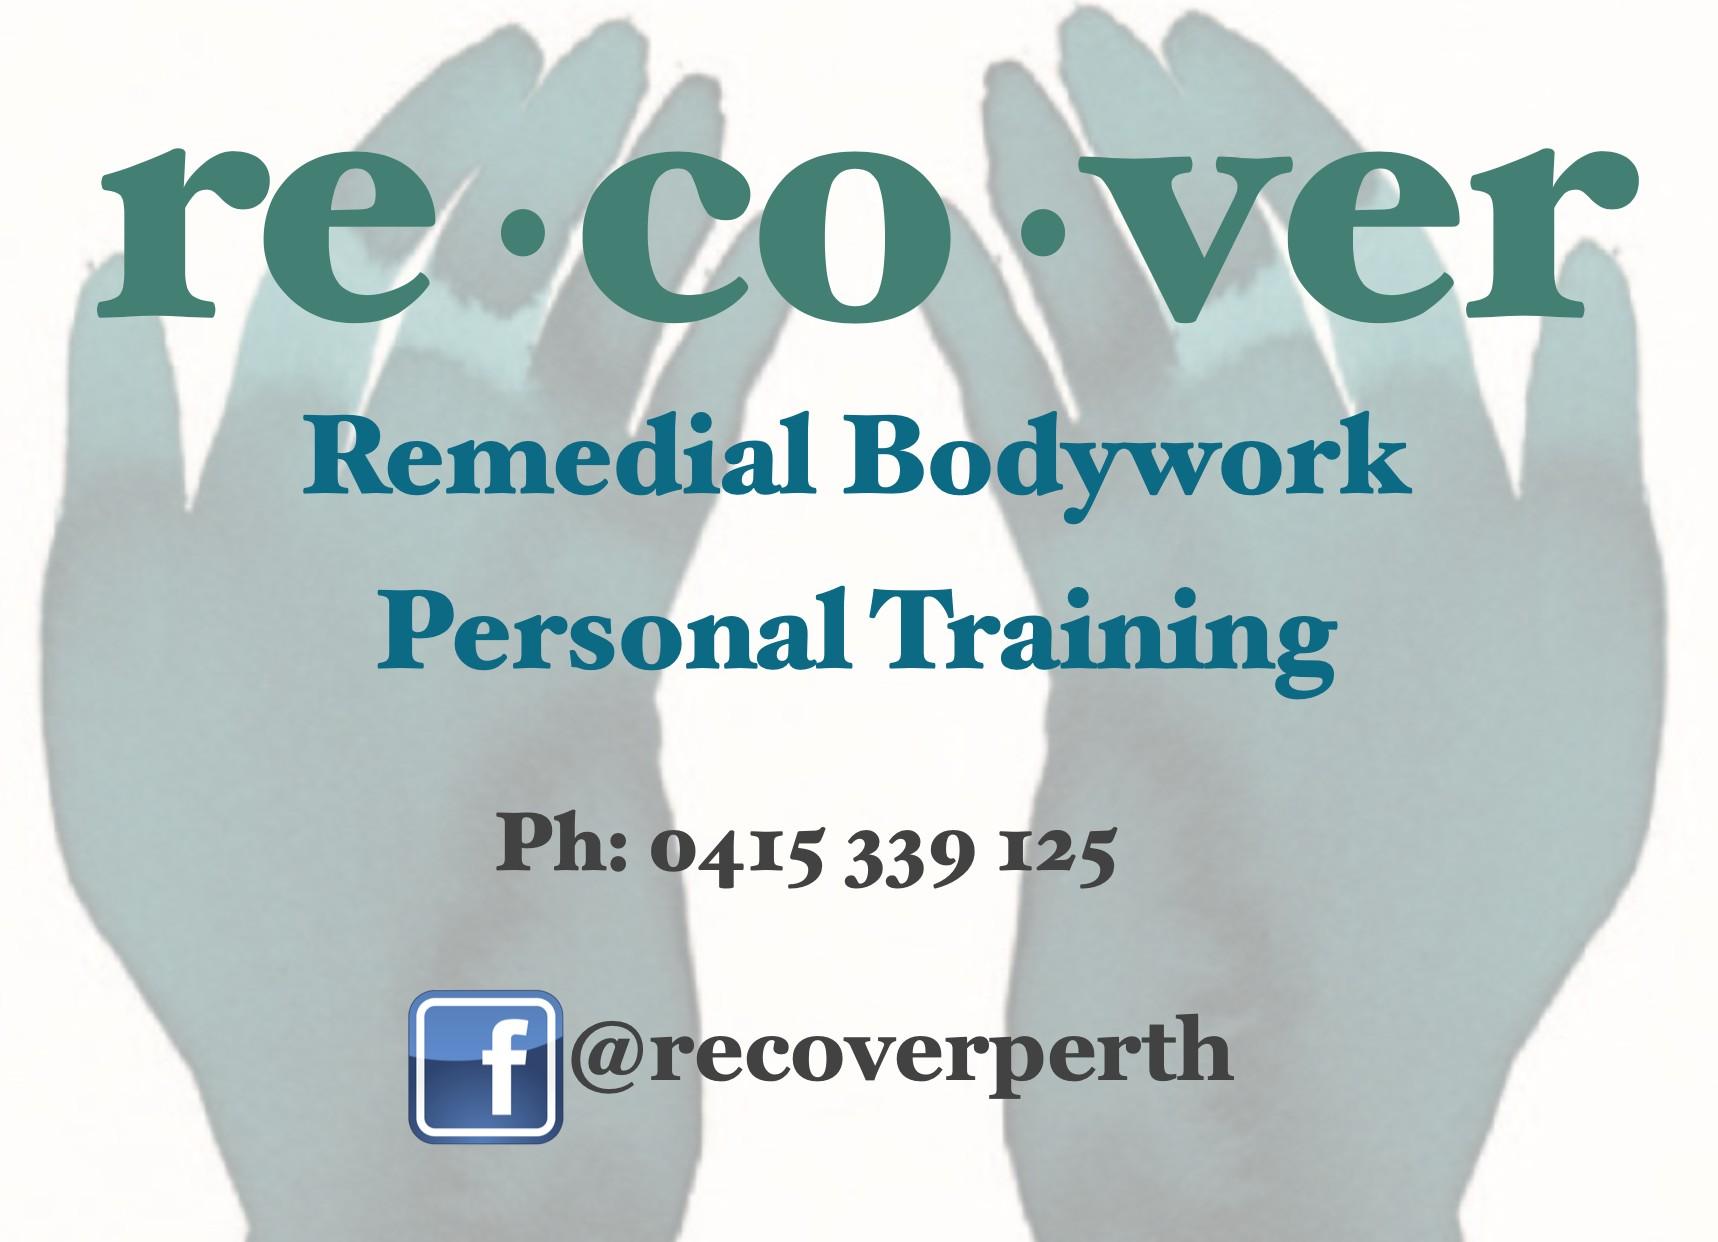 Recover Bodywork